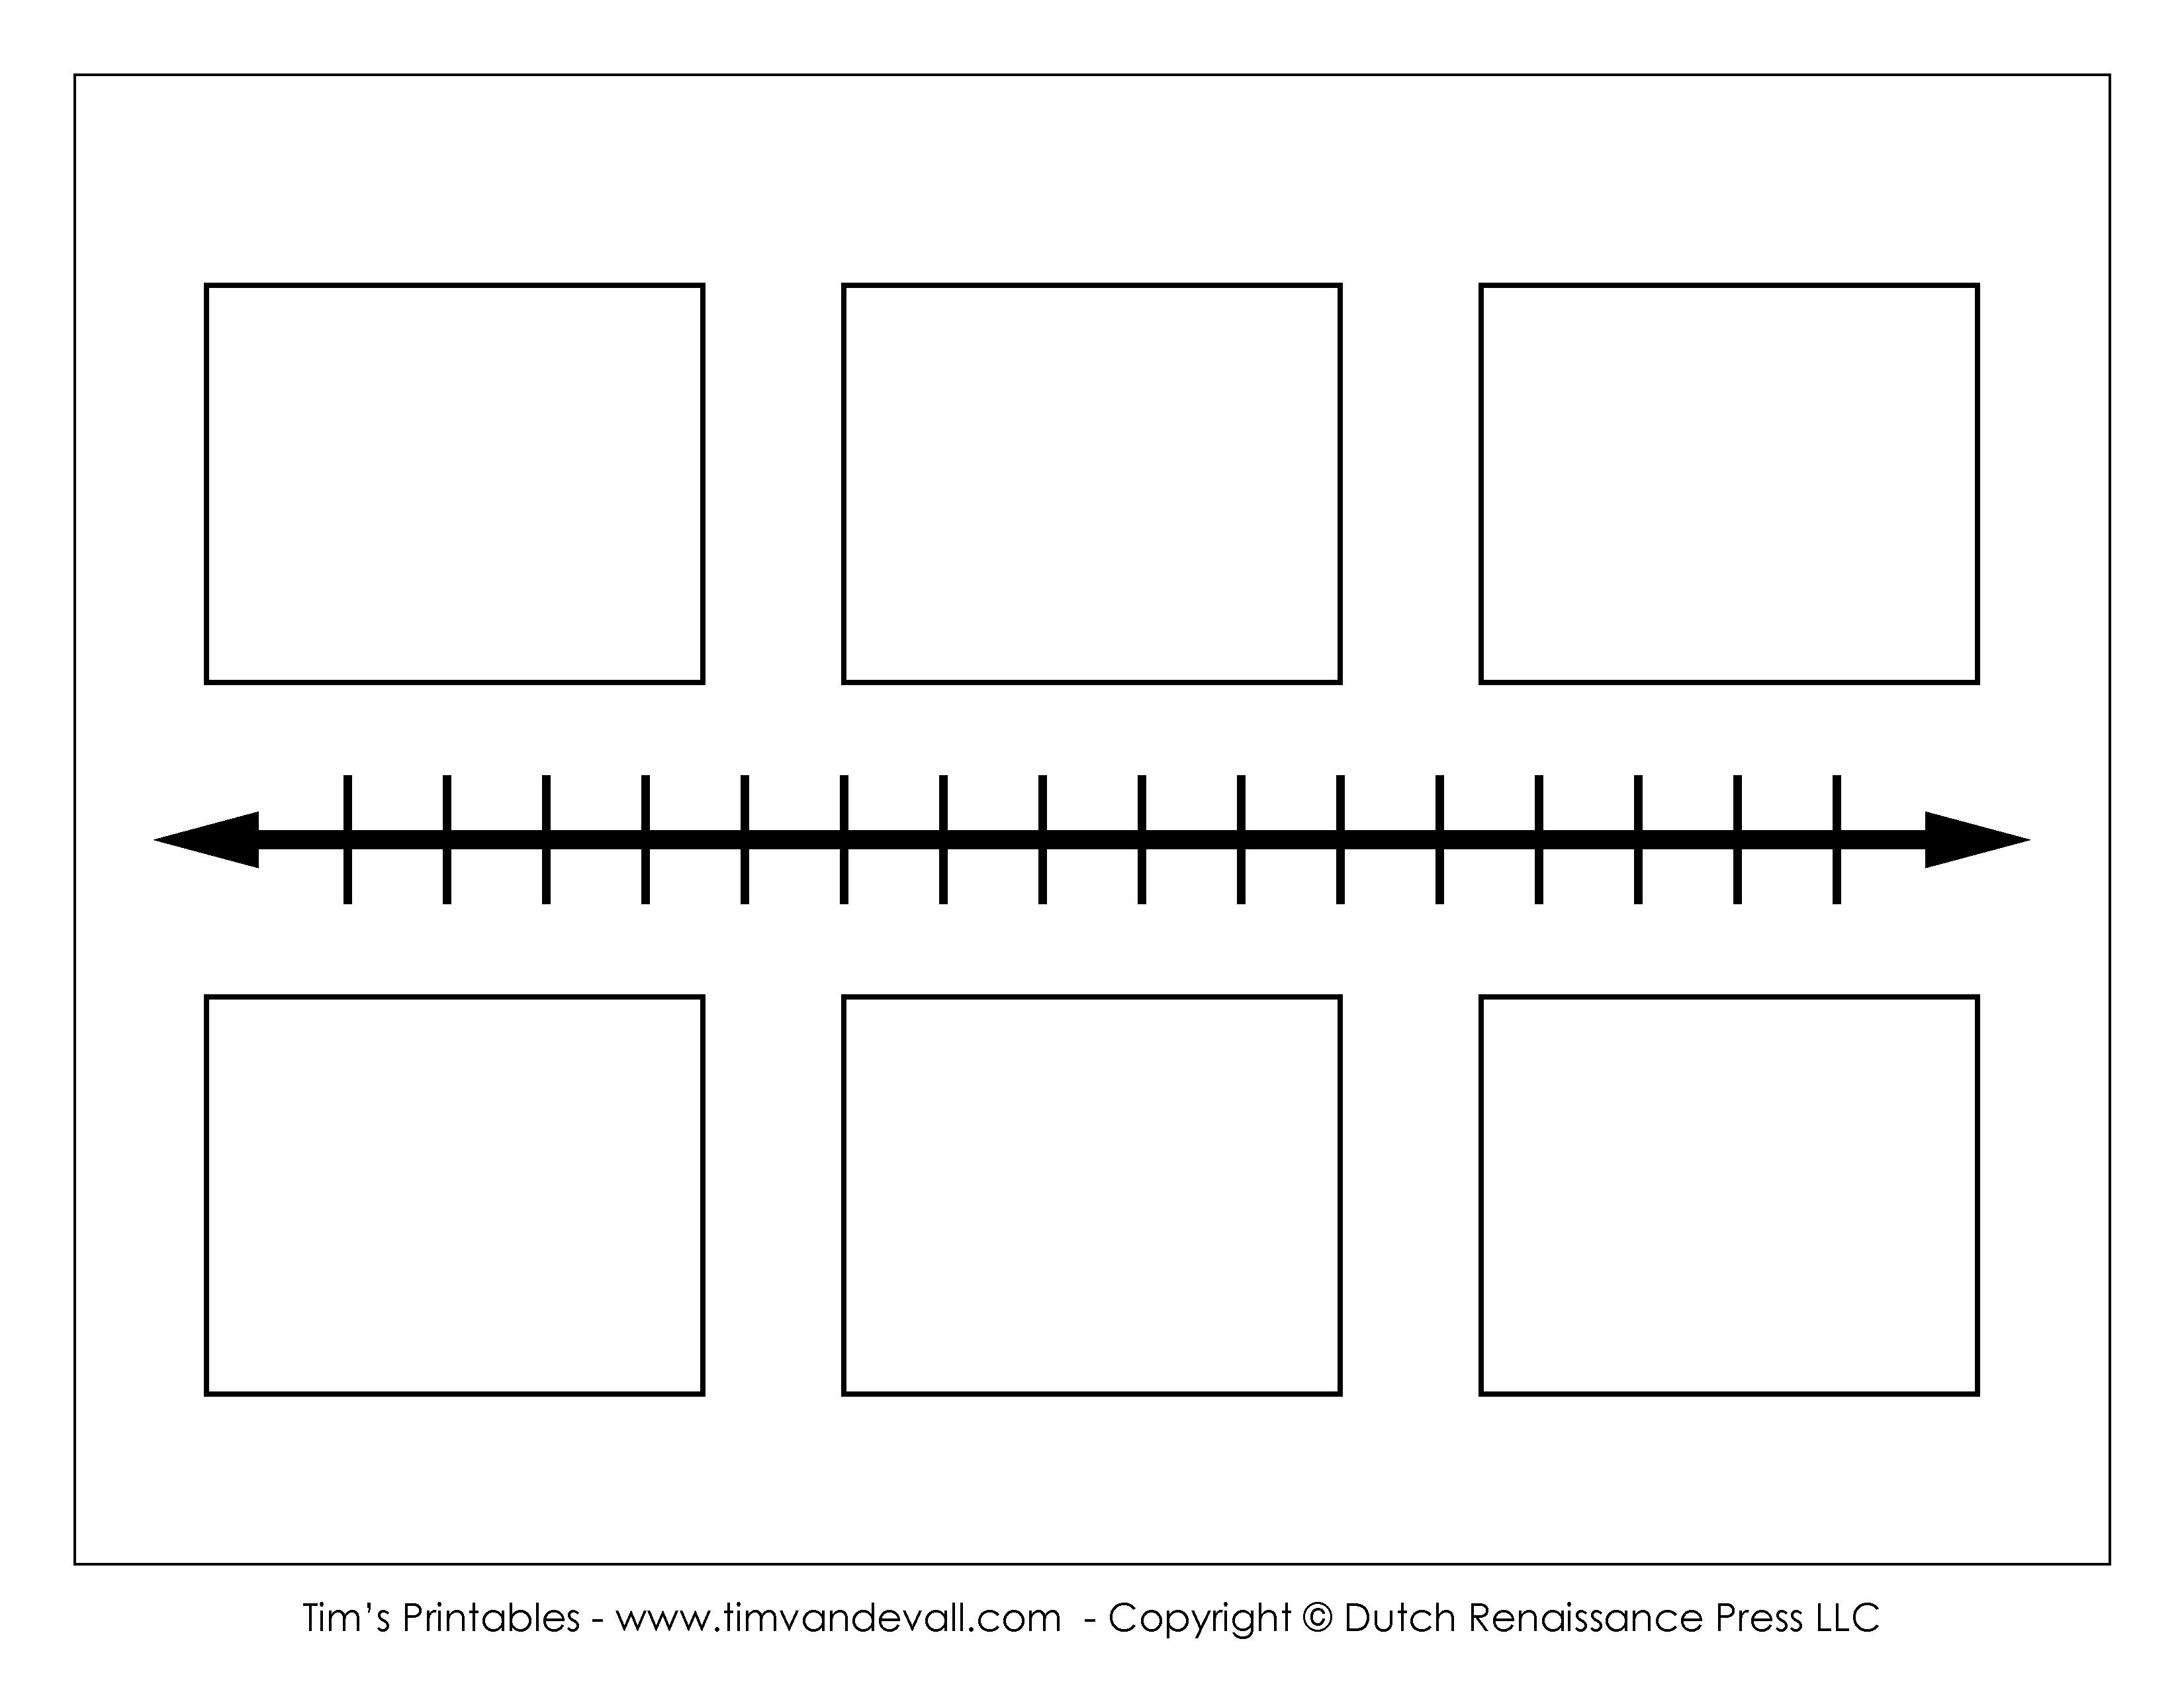 Printable Timeline Template | Ellipsis - Free Blank Timeline Template Printable